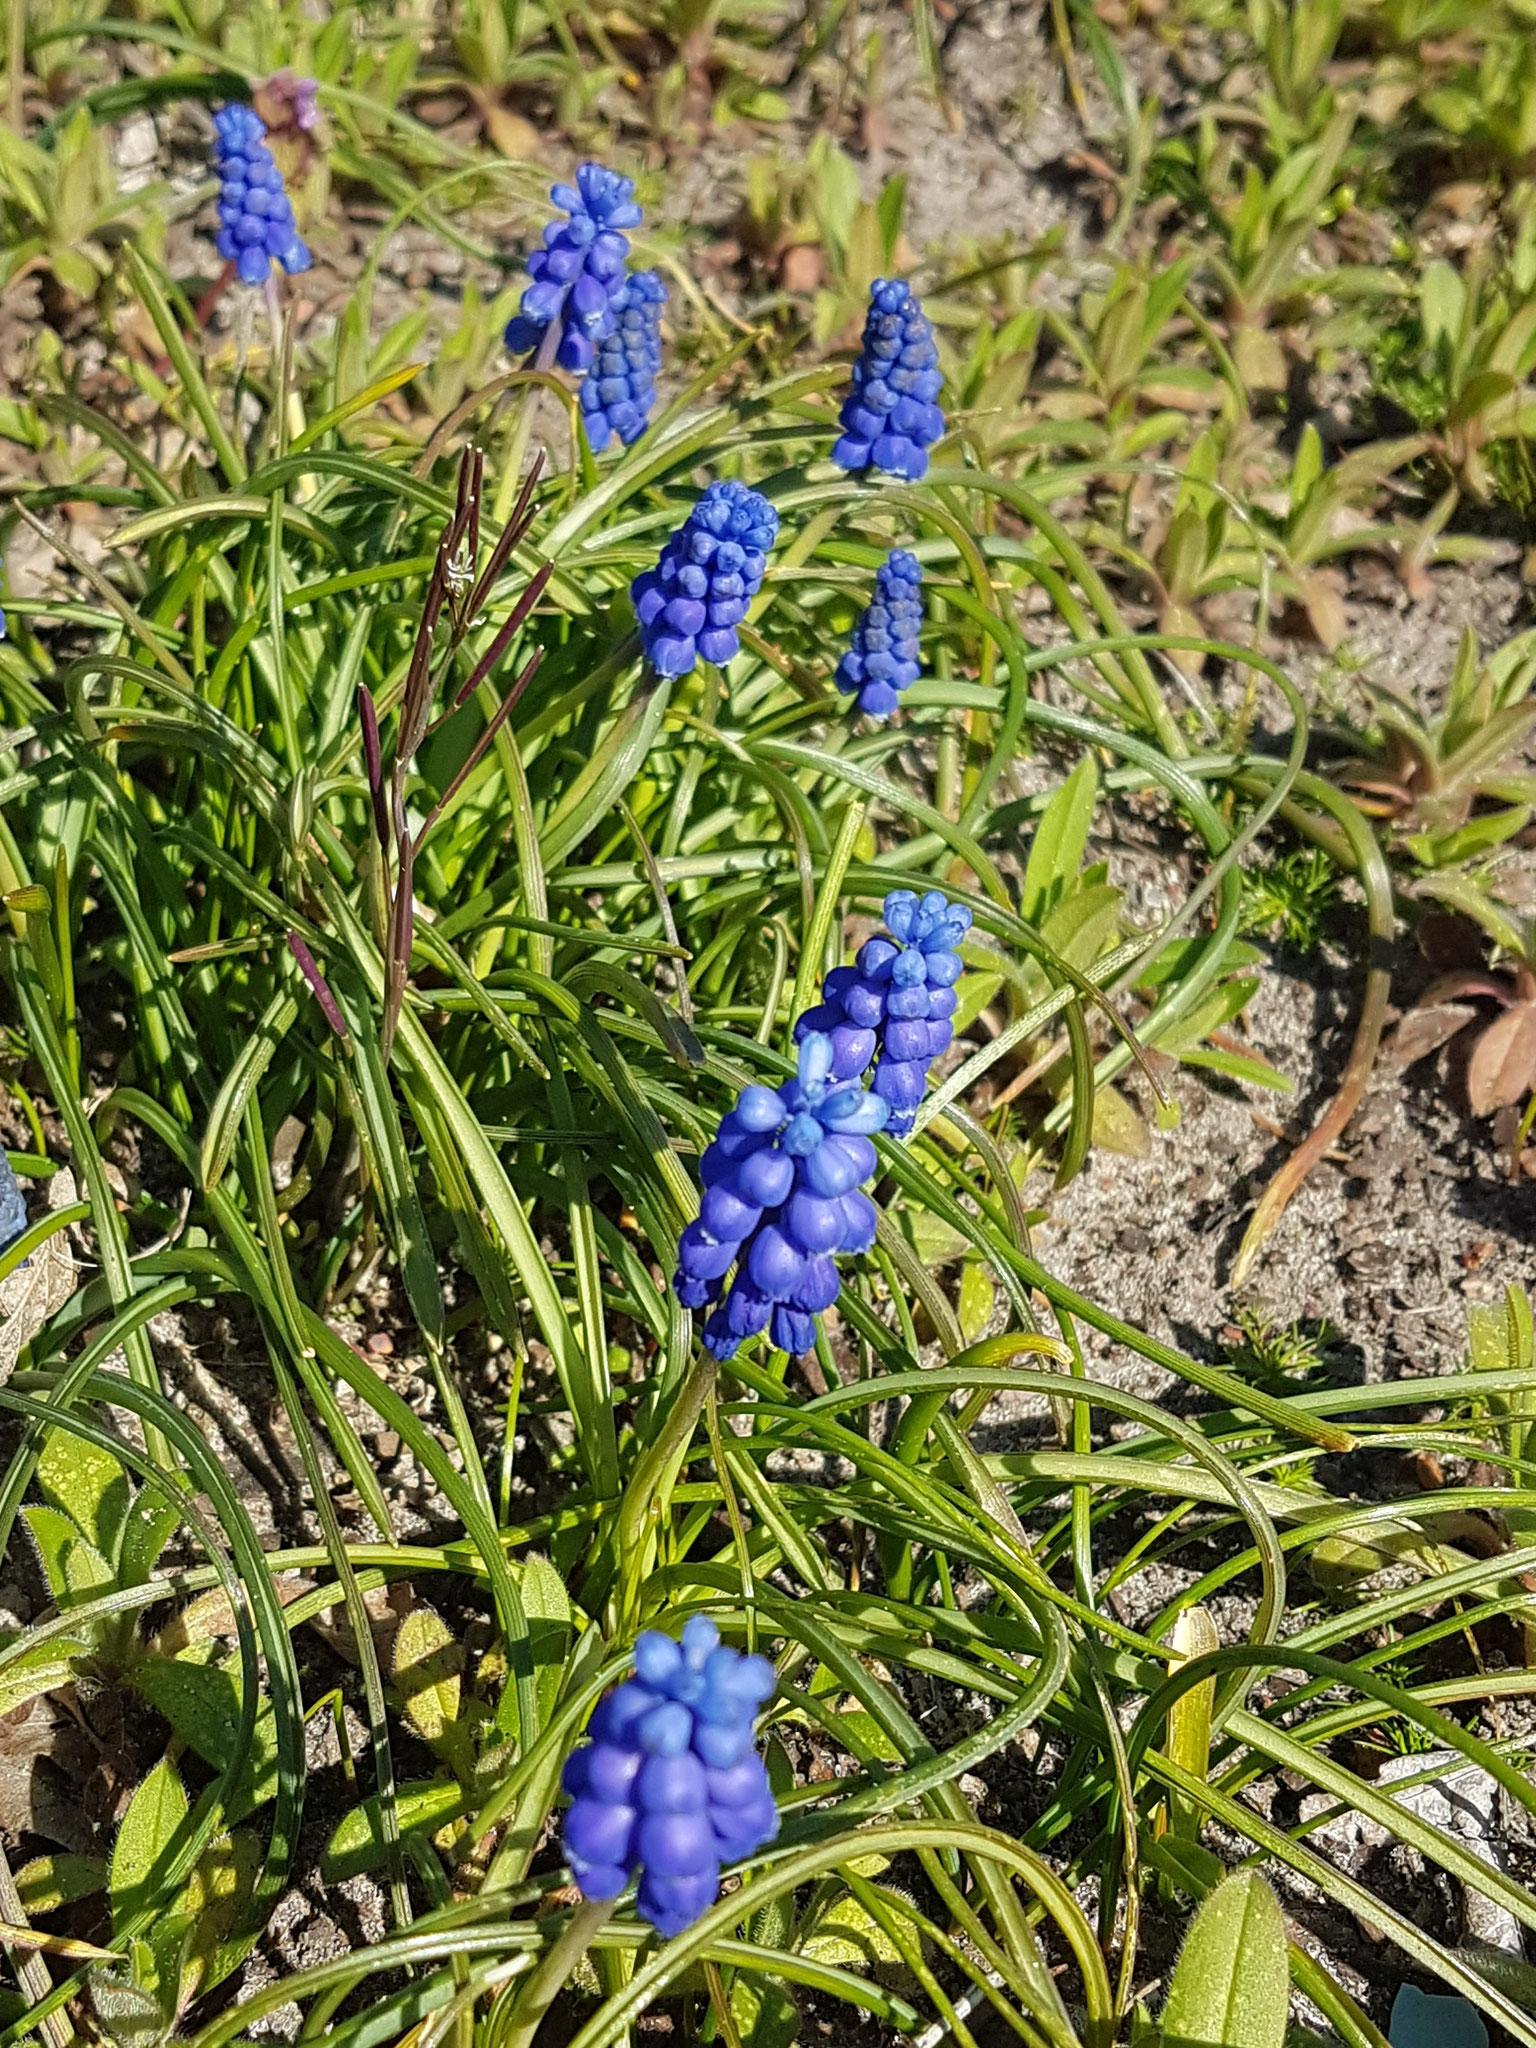 Grape Hyacinths / Traubenhyazinthen